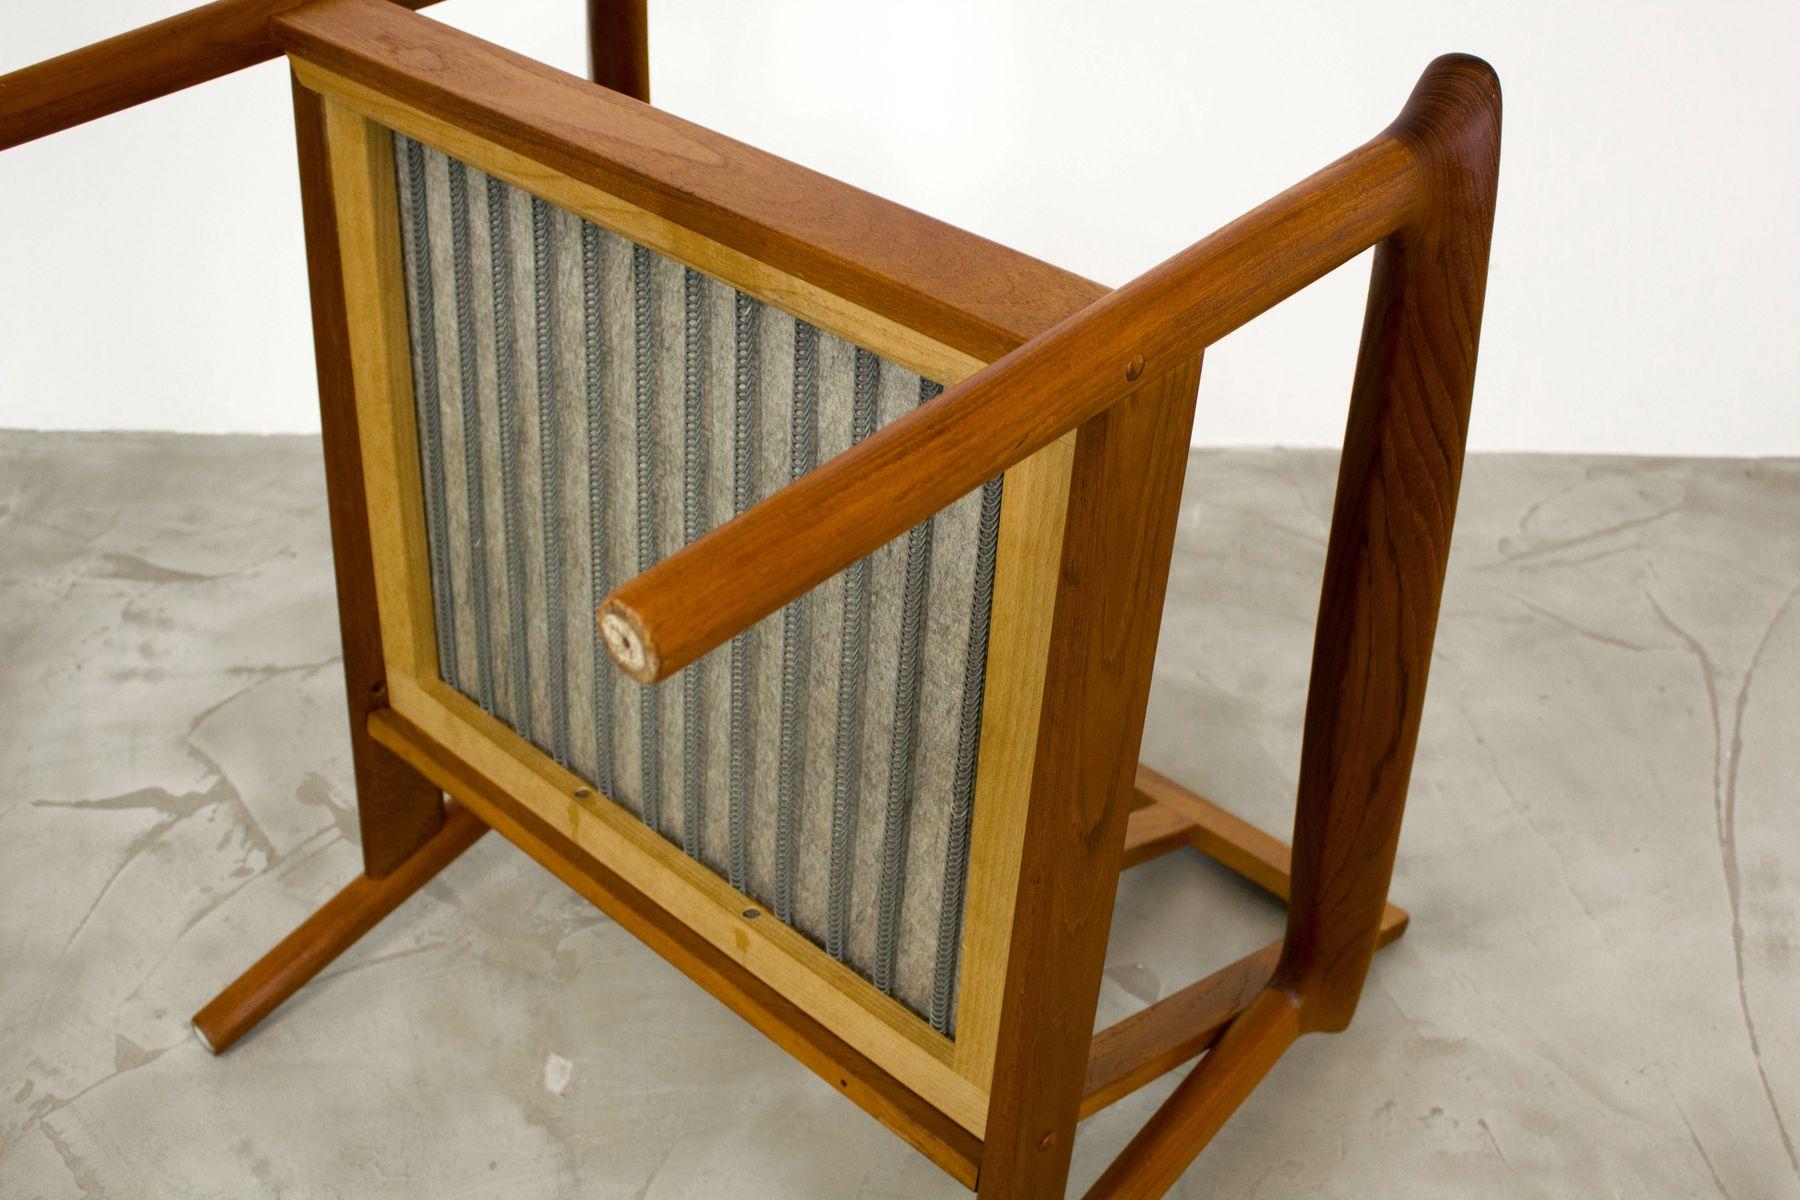 Vintage Danish Teak Easy Chair 1960s bei Pamono kaufen